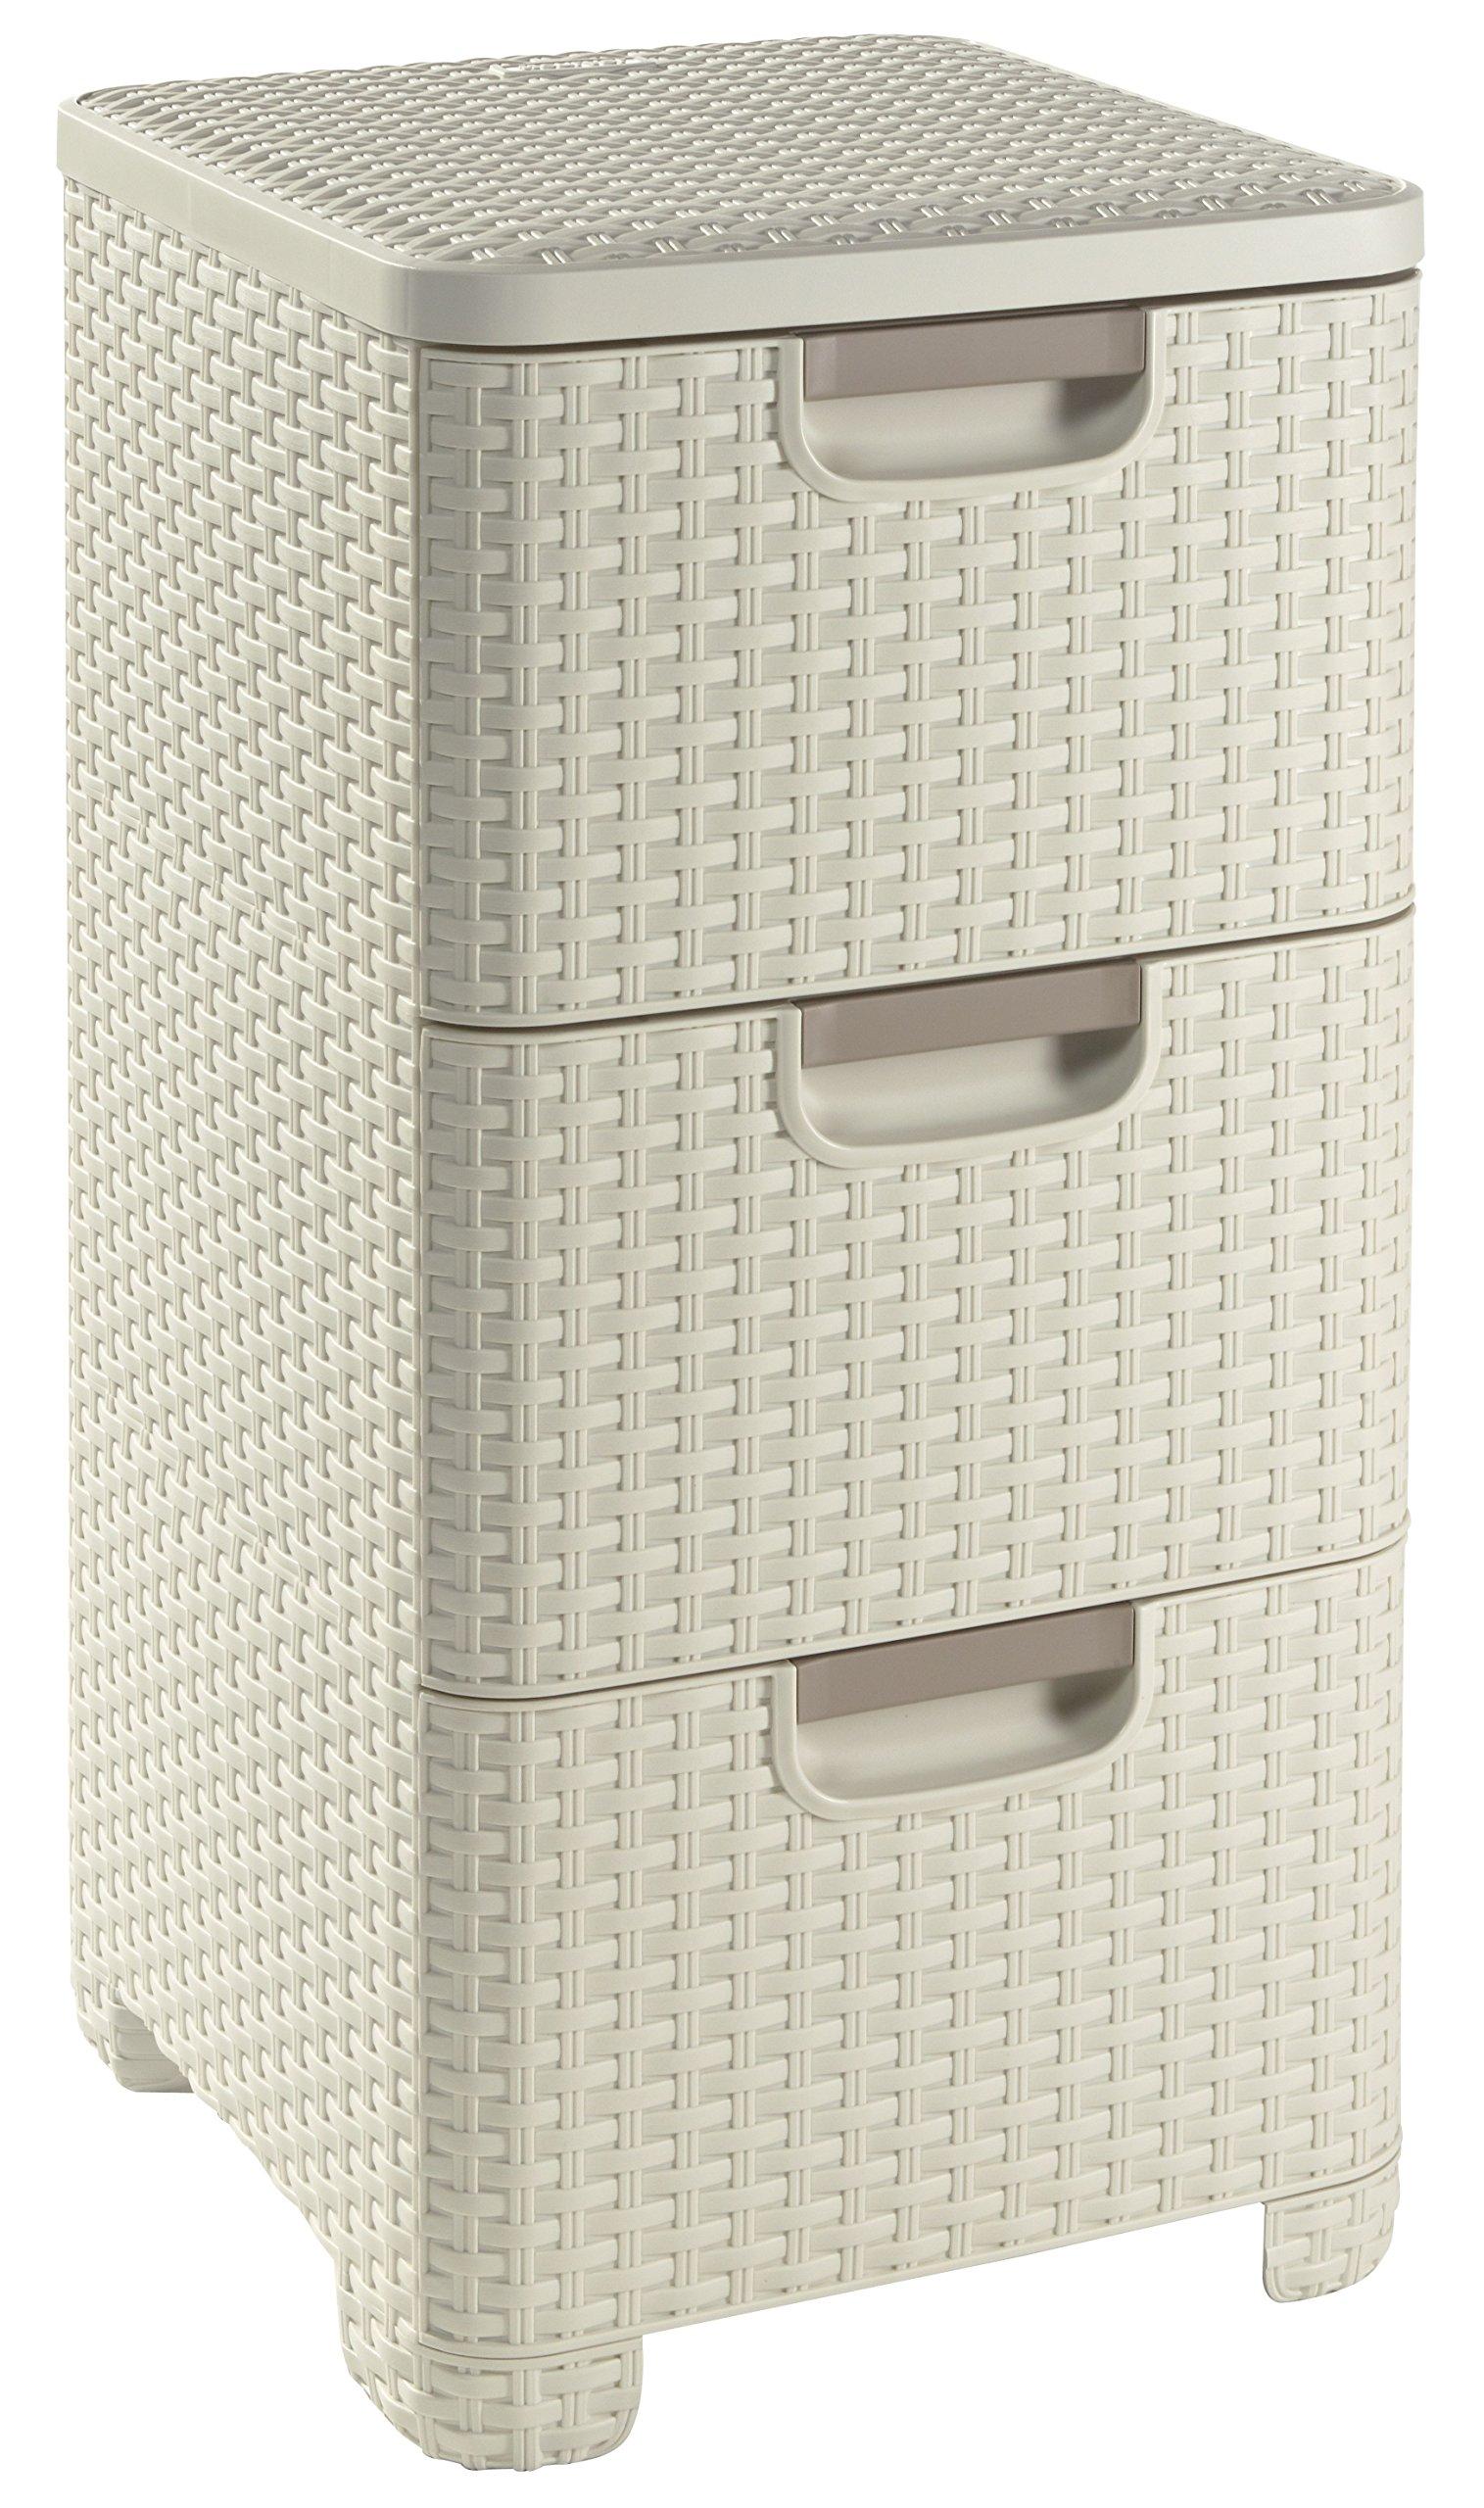 Curver - Cajonera Style de 3 Cajones 14L. - Con Patas - Color Blanco Roto